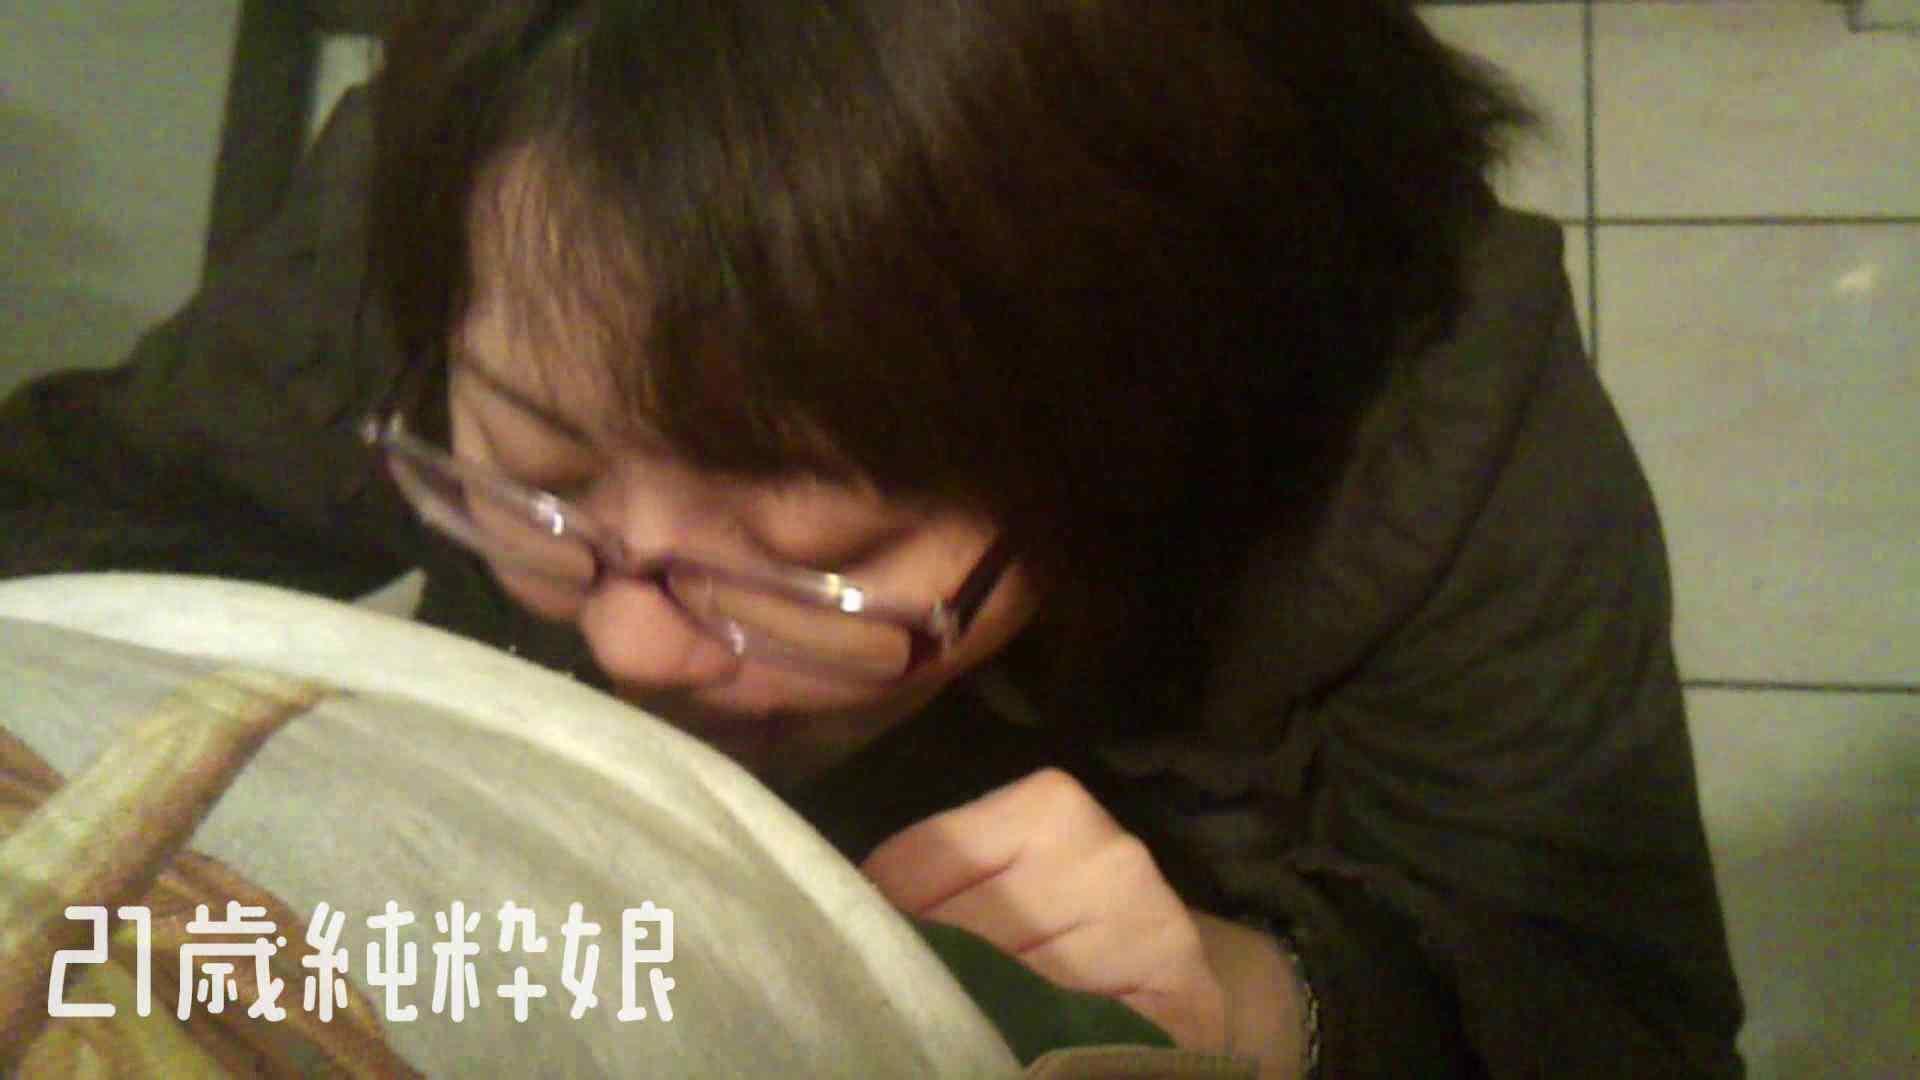 Gカップ21歳純粋嬢第2弾Vol.5 OLヌード天国  110PIX 36